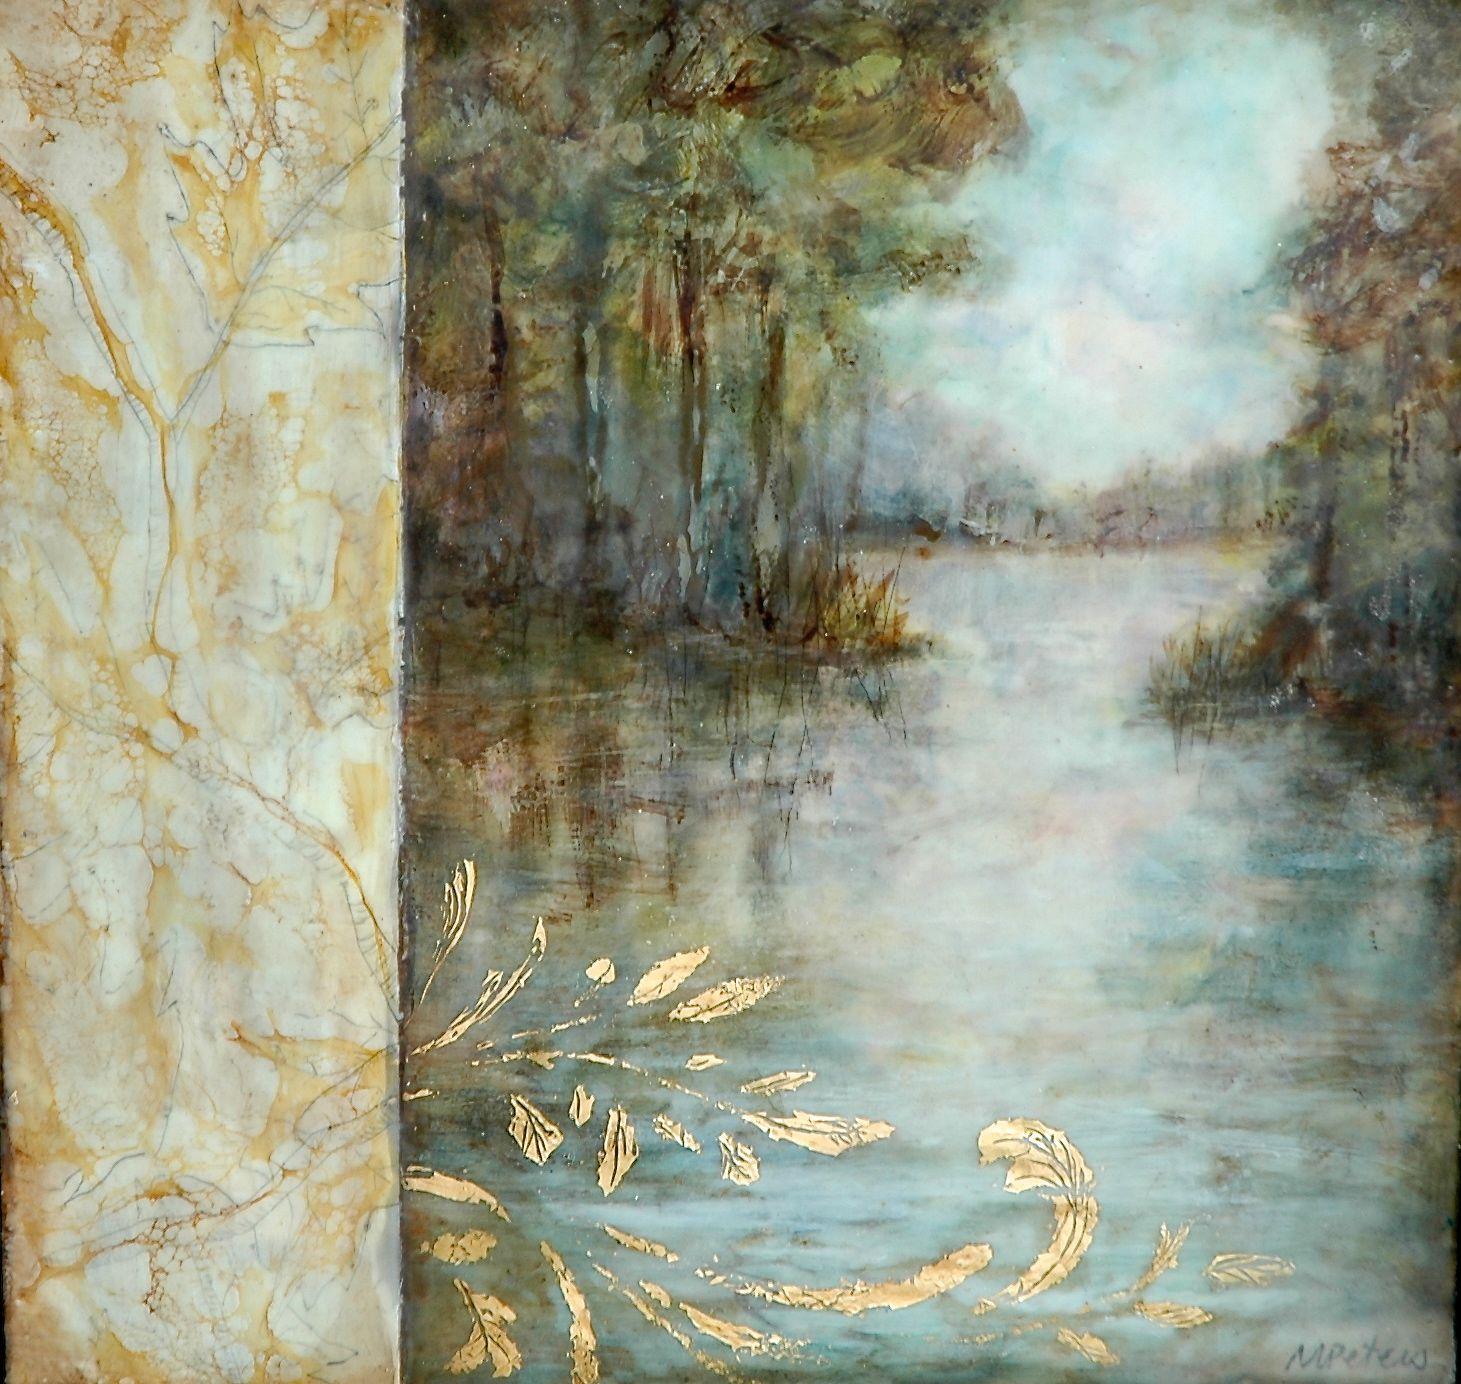 Watercolor artists websites -  Flourish Michaelle Peters Charlwood Michaellepc Com Encaustic Oil Mixed Artists Websitesencaustic